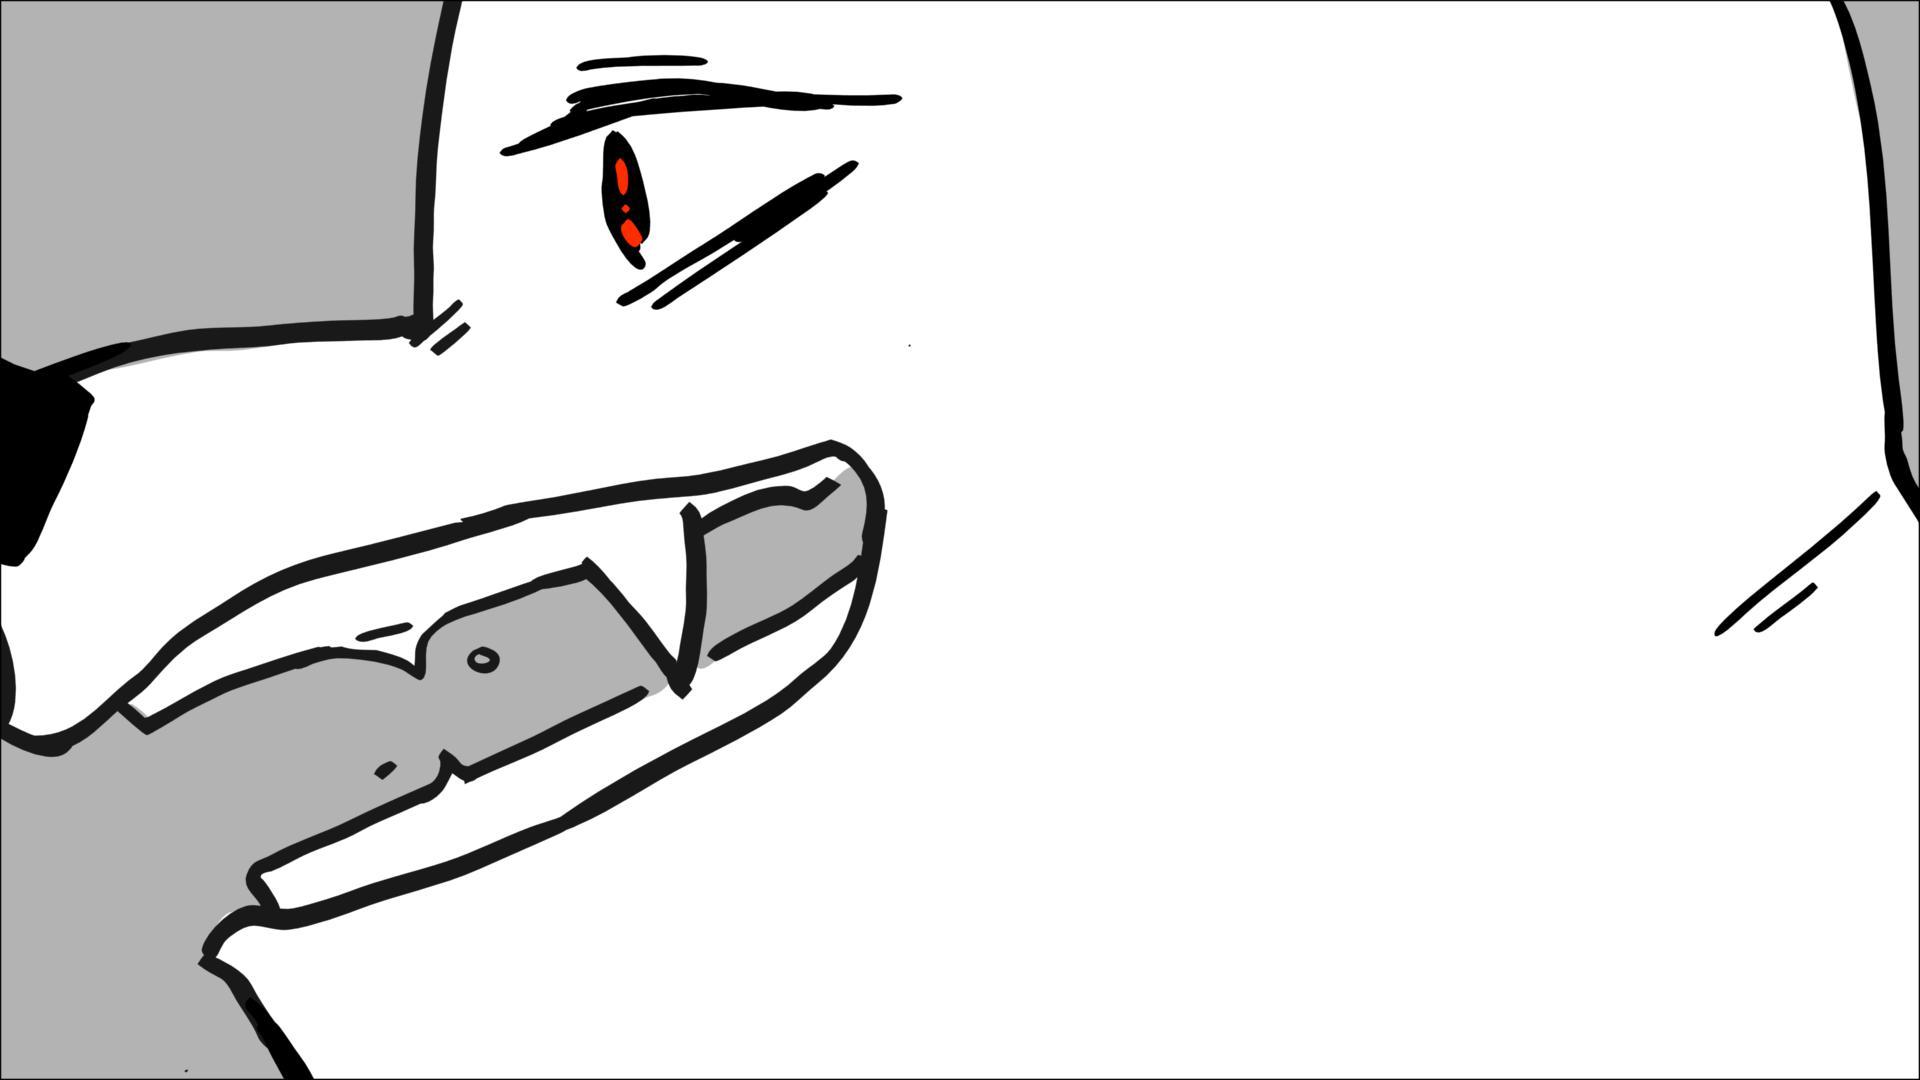 Blades of Furry-000074-03.jpg